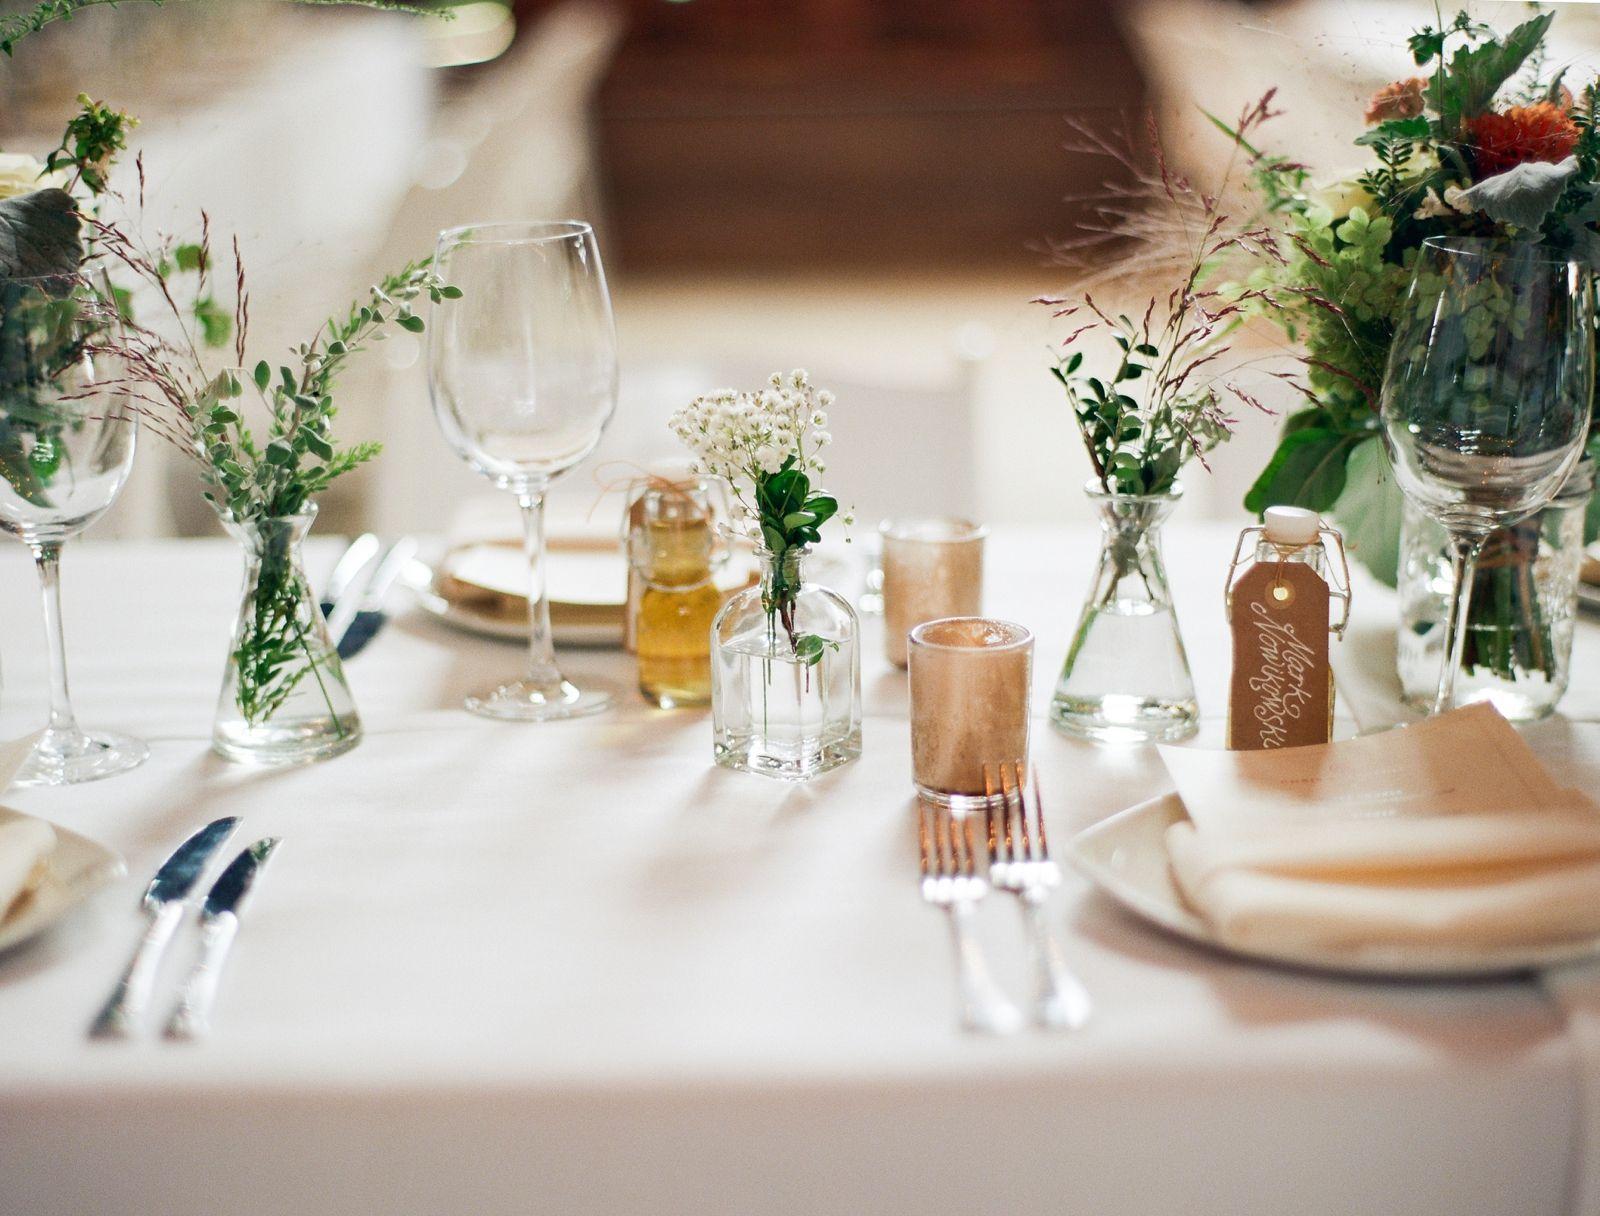 Modern wedding decor images  North Meets South Panorama Farms Wedding  Wedding Decor Inspiration